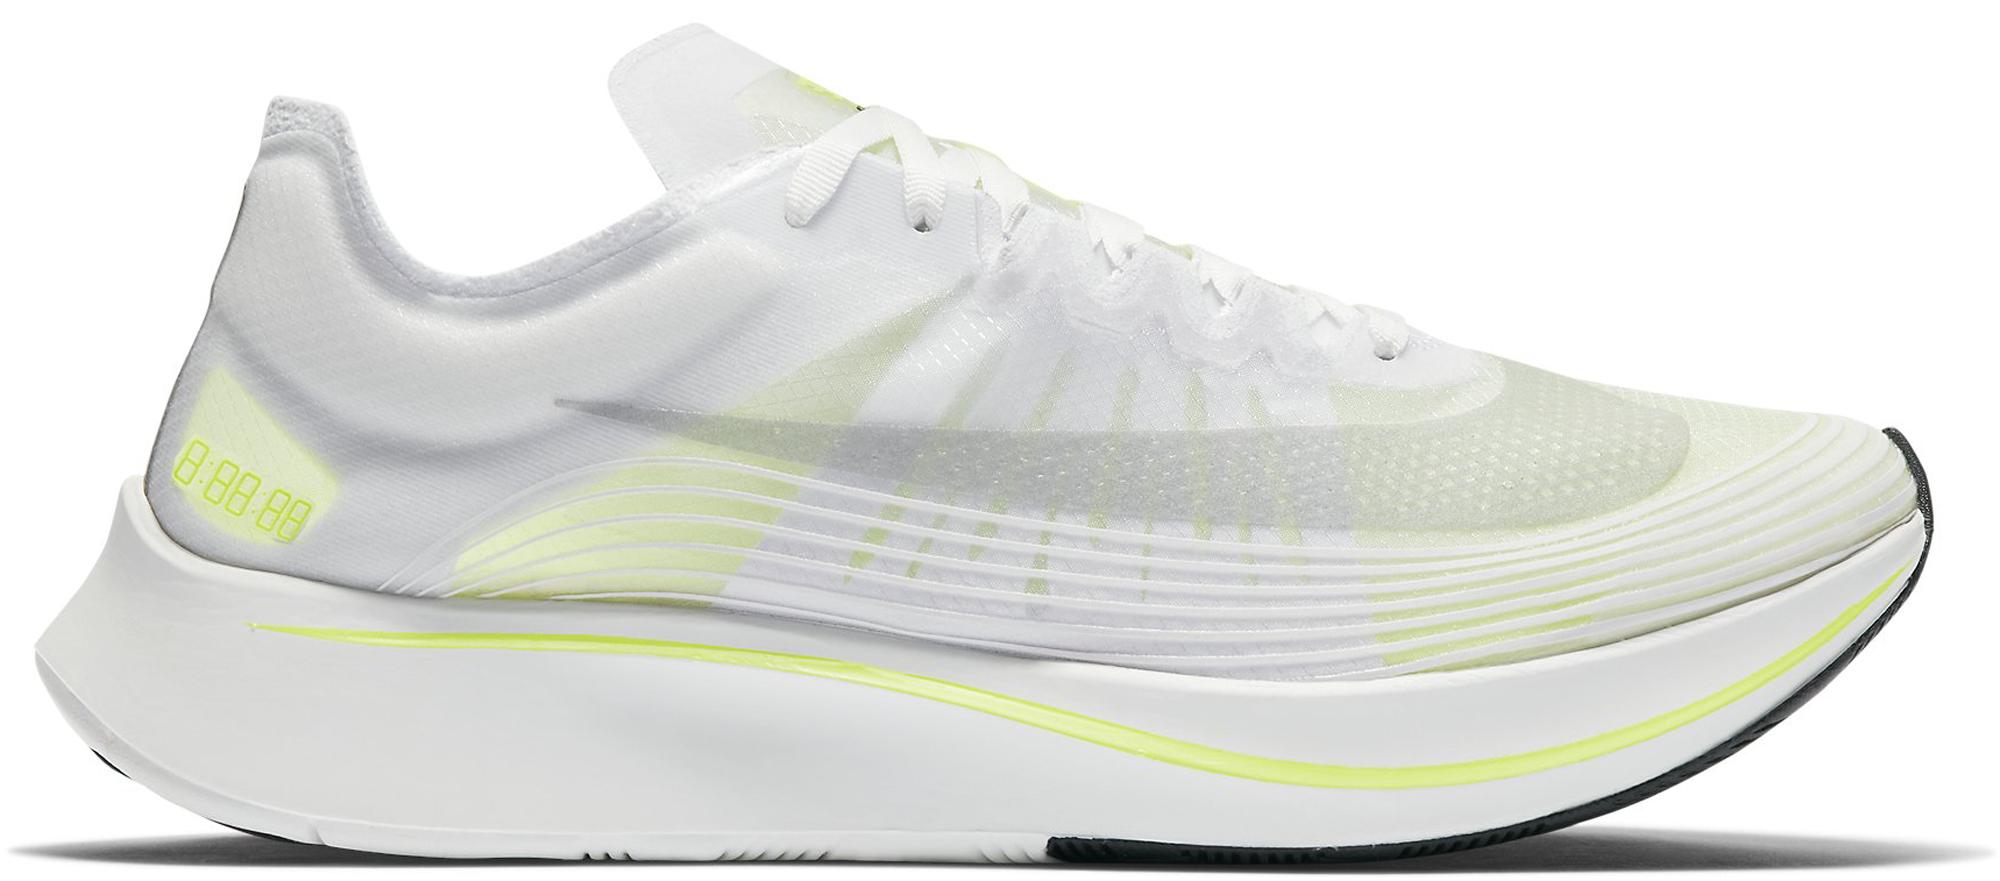 Nike Zoom Fly White Volt - AJ9282-107